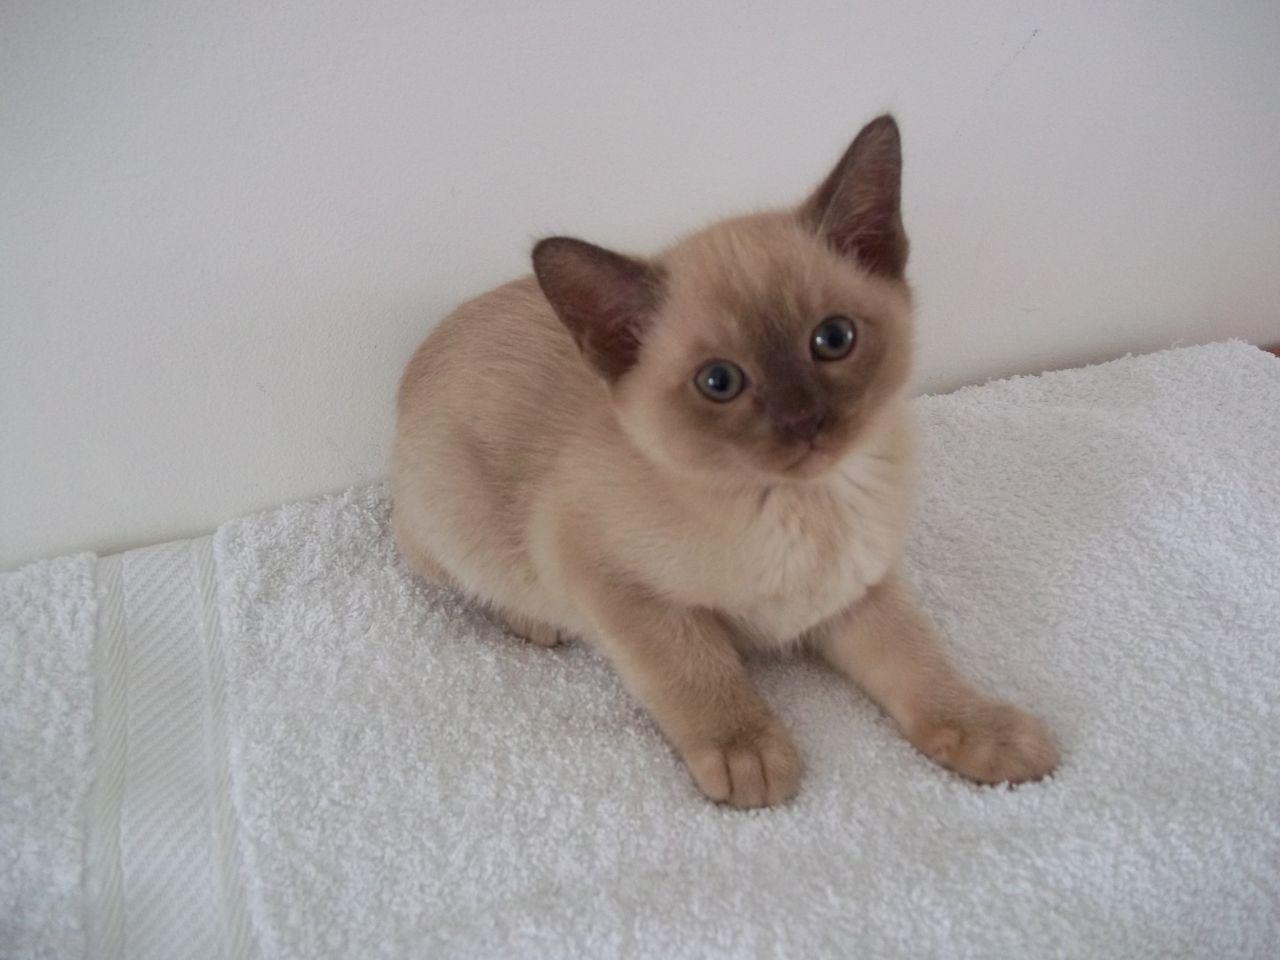 Burmese Kitten: Burmese Bumese Variant Kittens Shrewsbury Breed